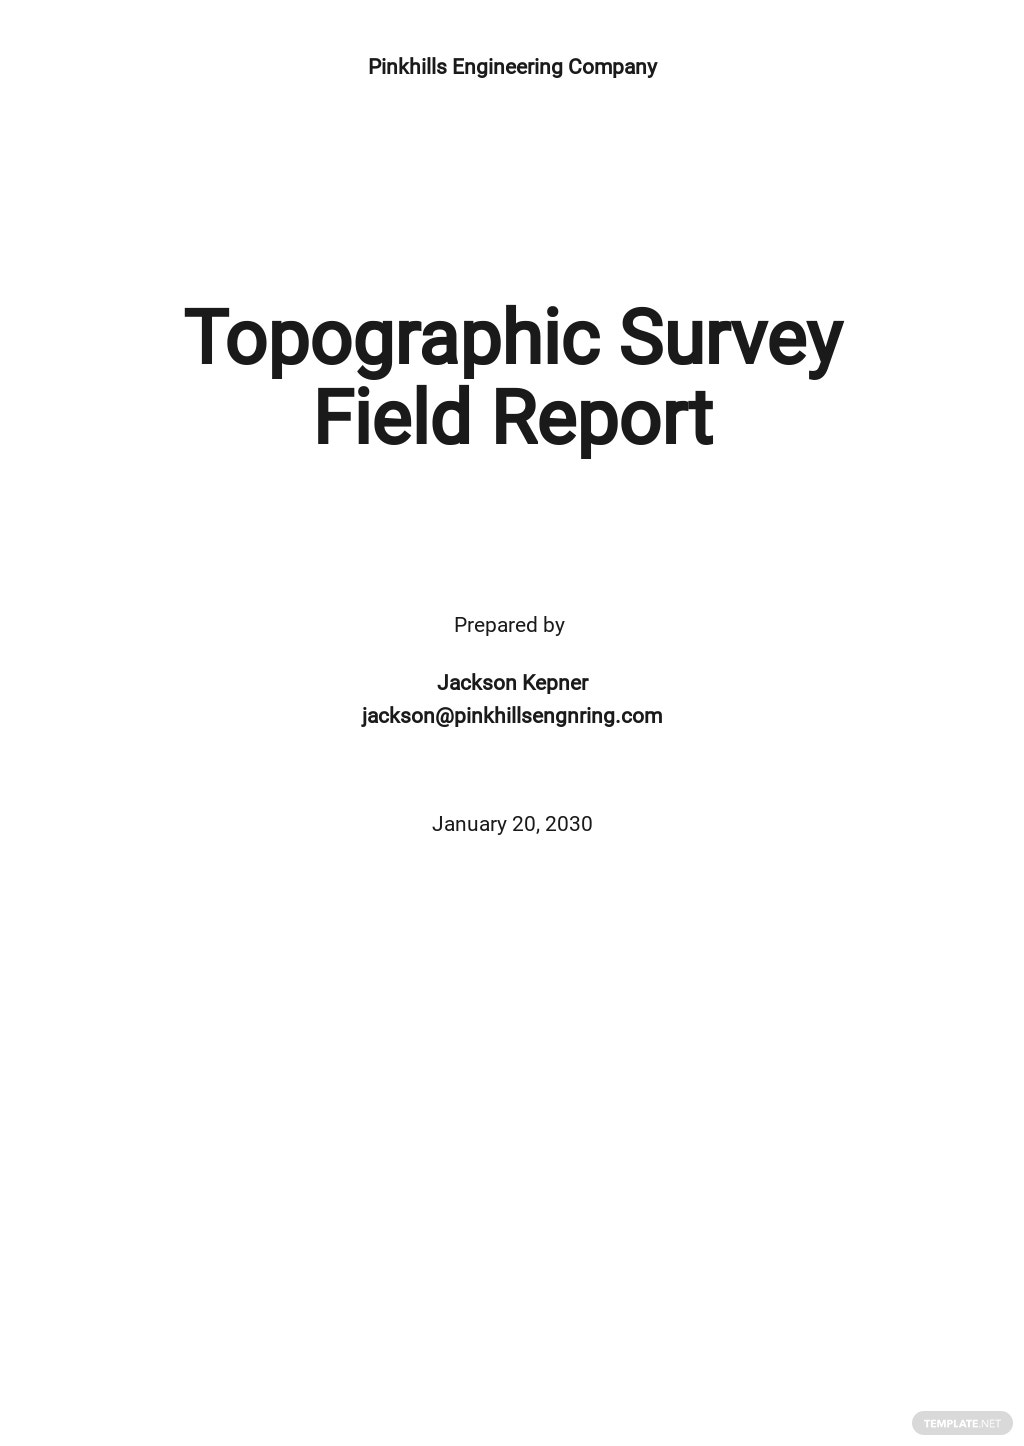 FREE Construction Field Report Template - Google Docs, Word